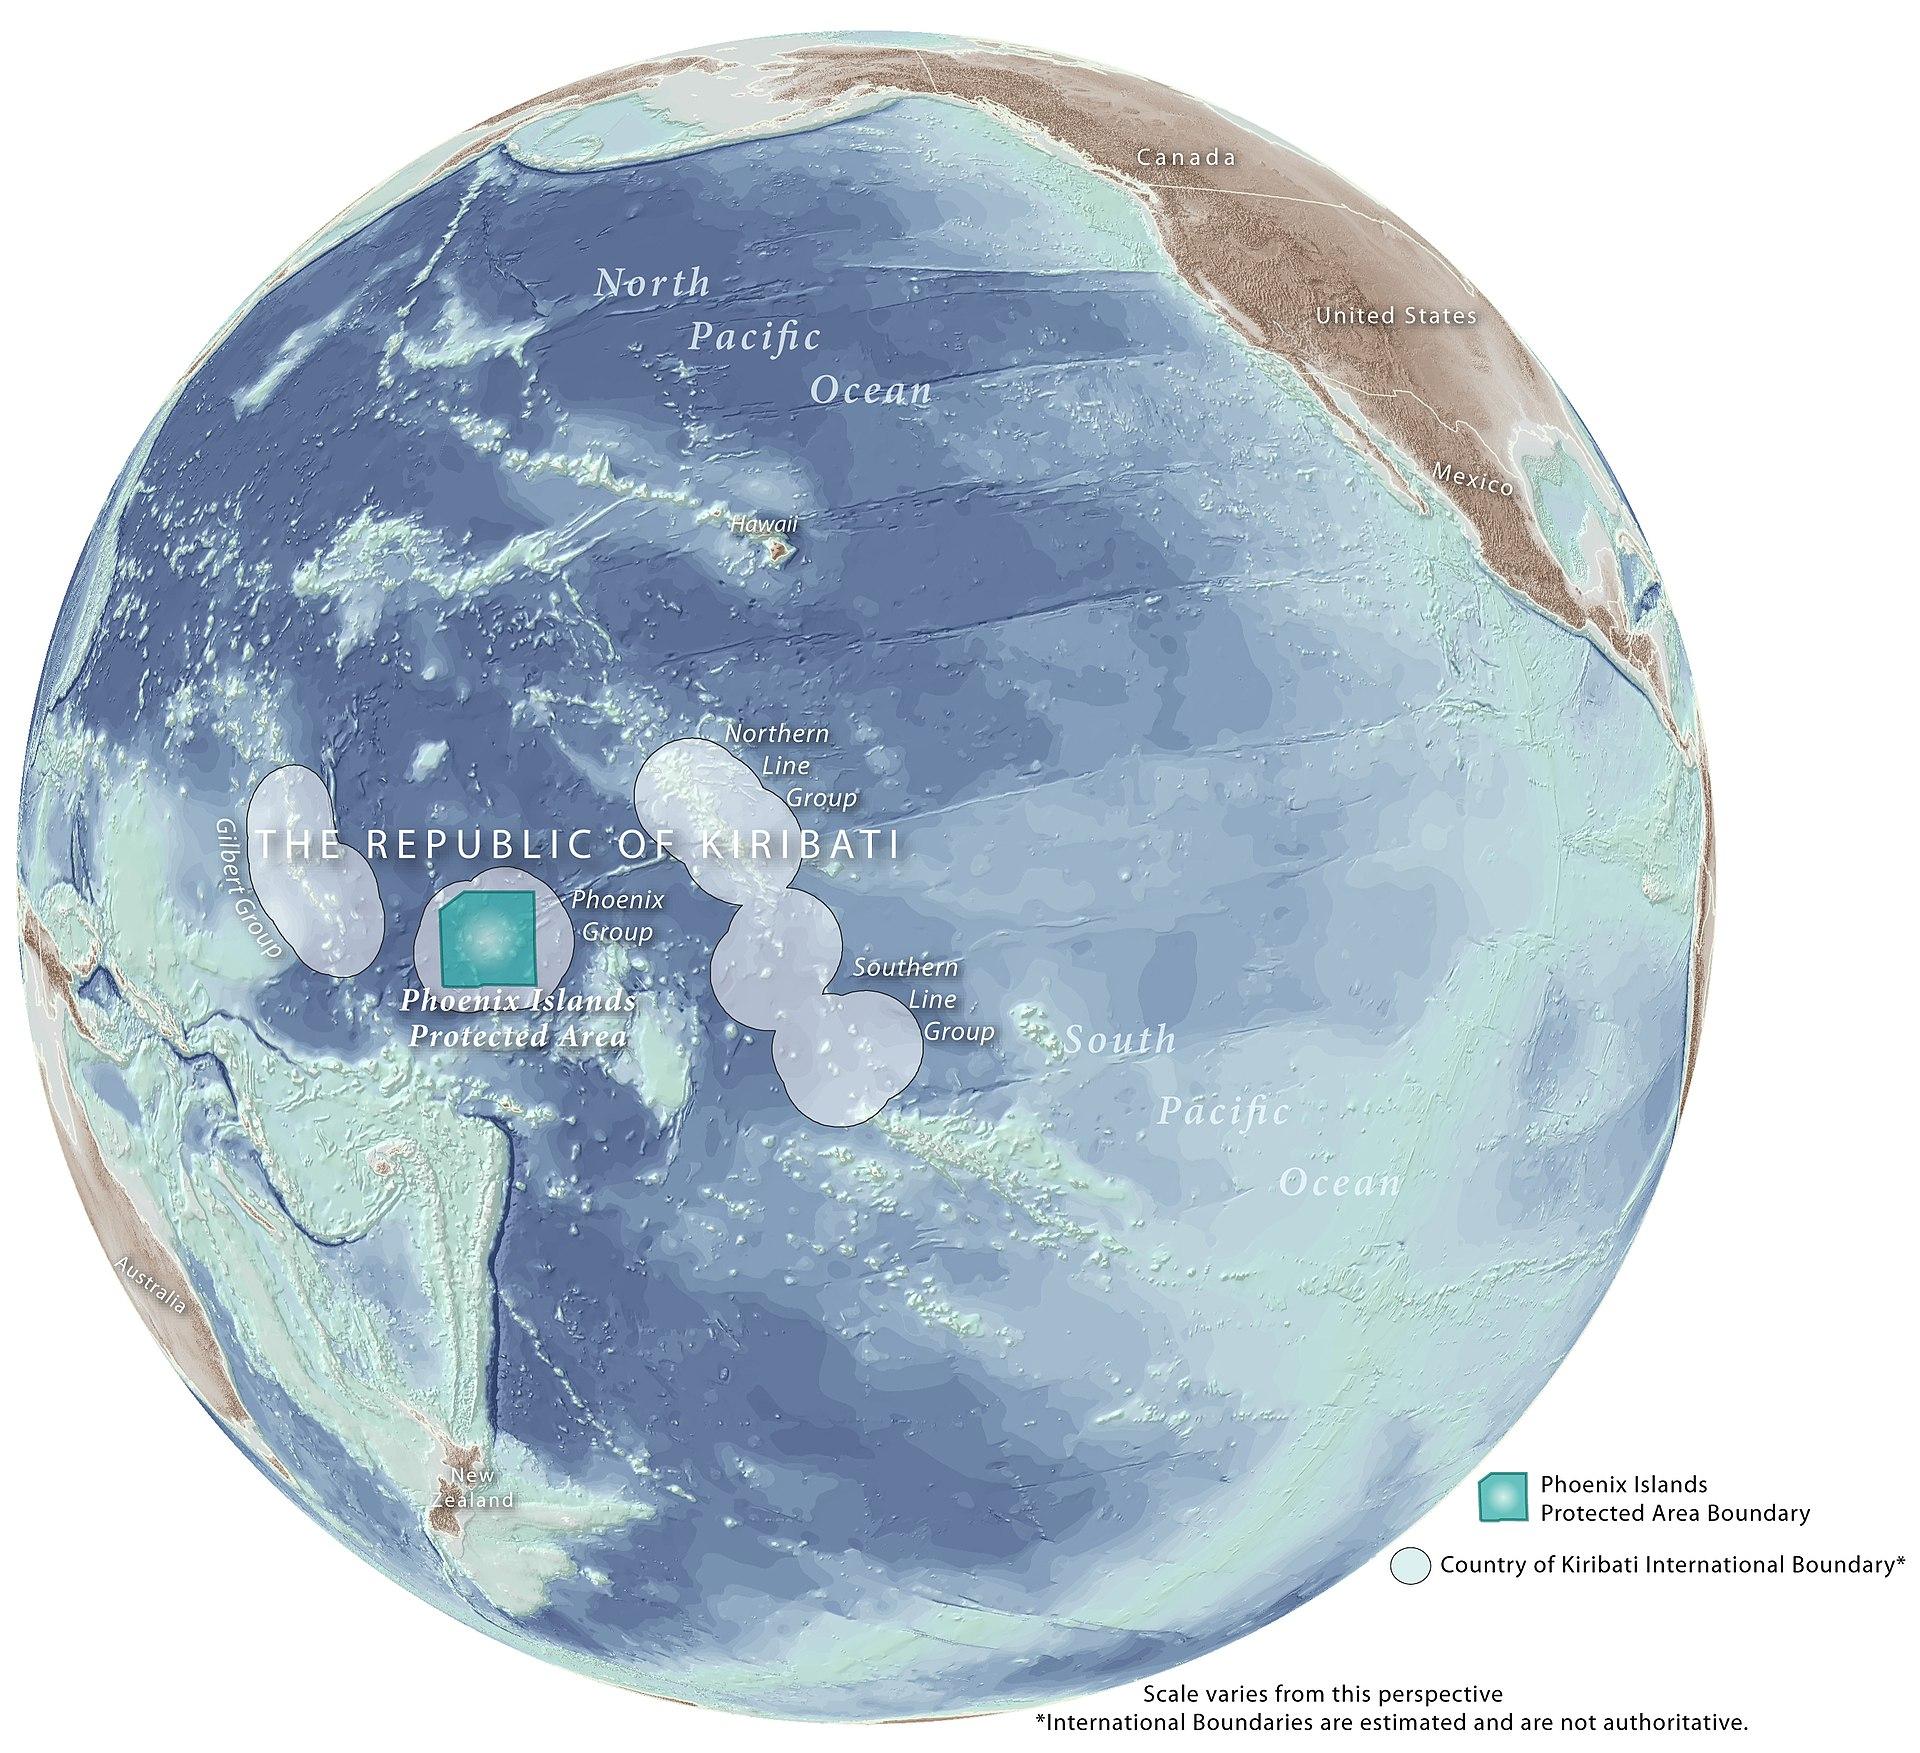 Phoenix Islands Protected Area - Wikipedia